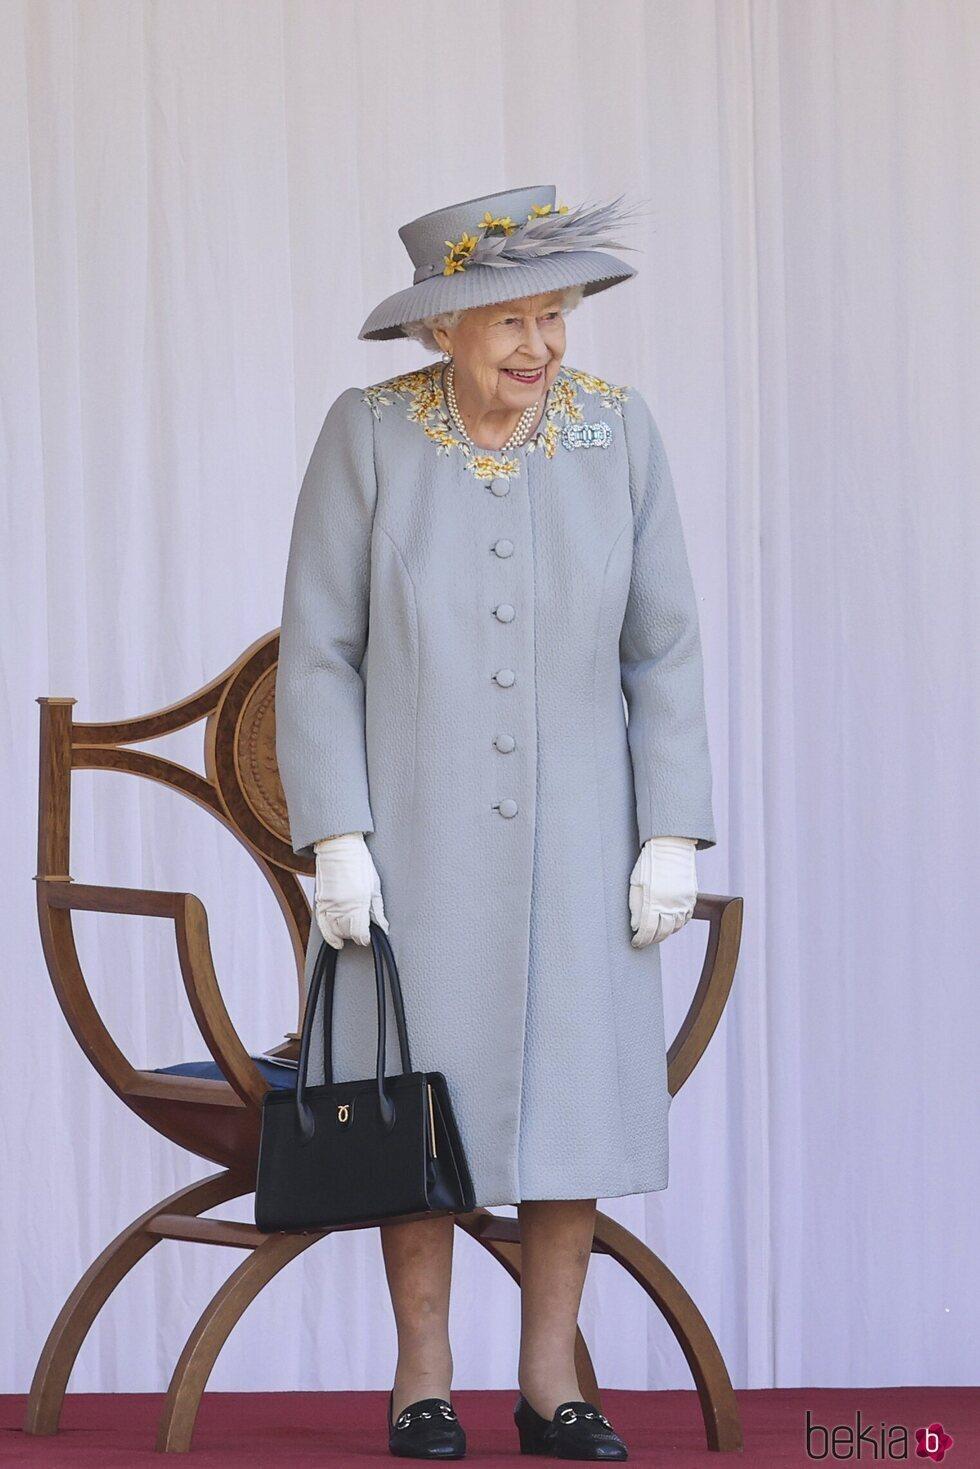 La Reina Isabel en Trooping the Colour 2021 en Windsor Castle